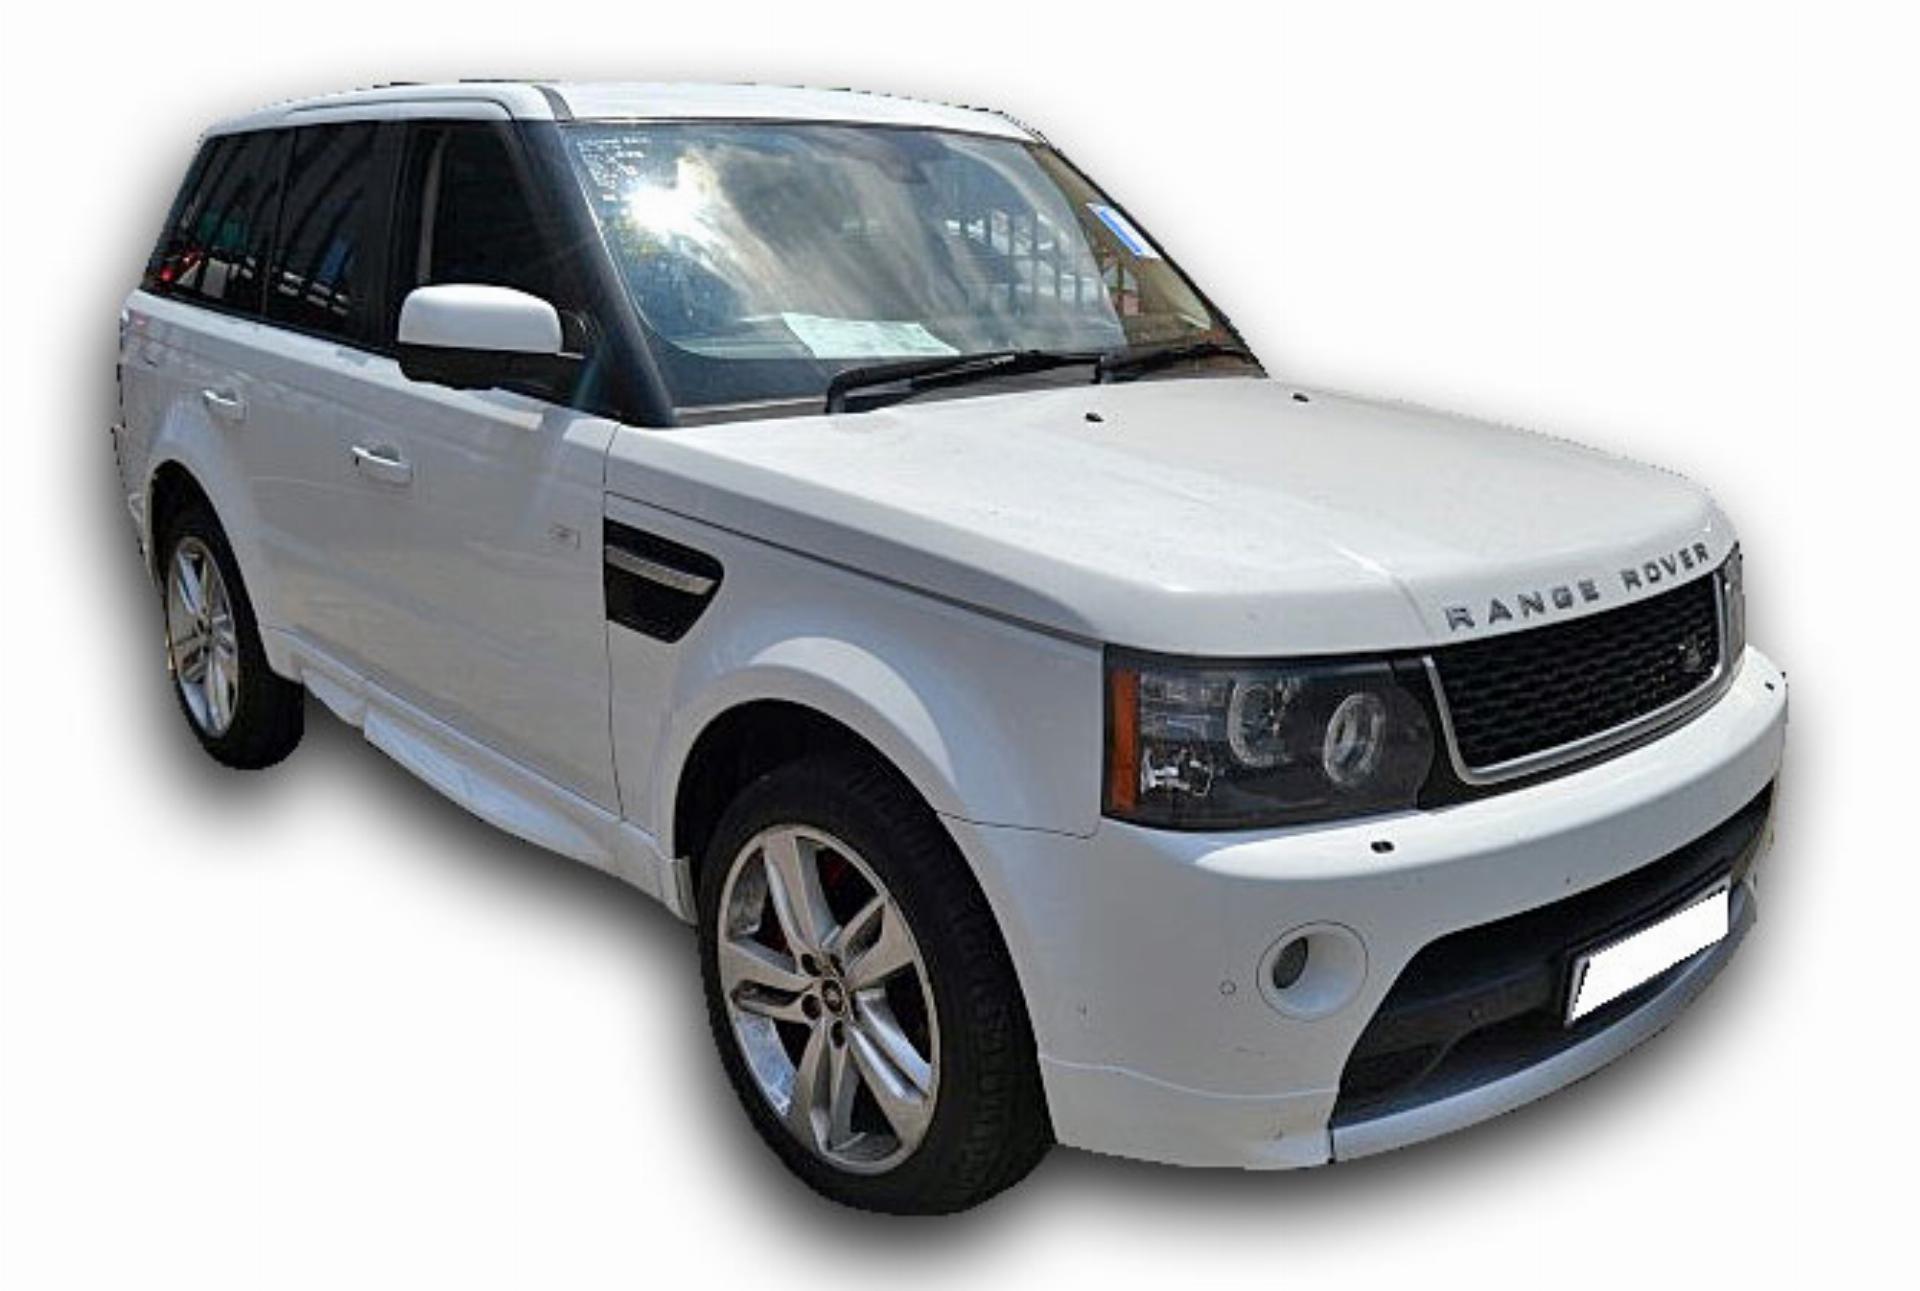 Land Rover Range Rover 5.0 V8 Sport Super Charged